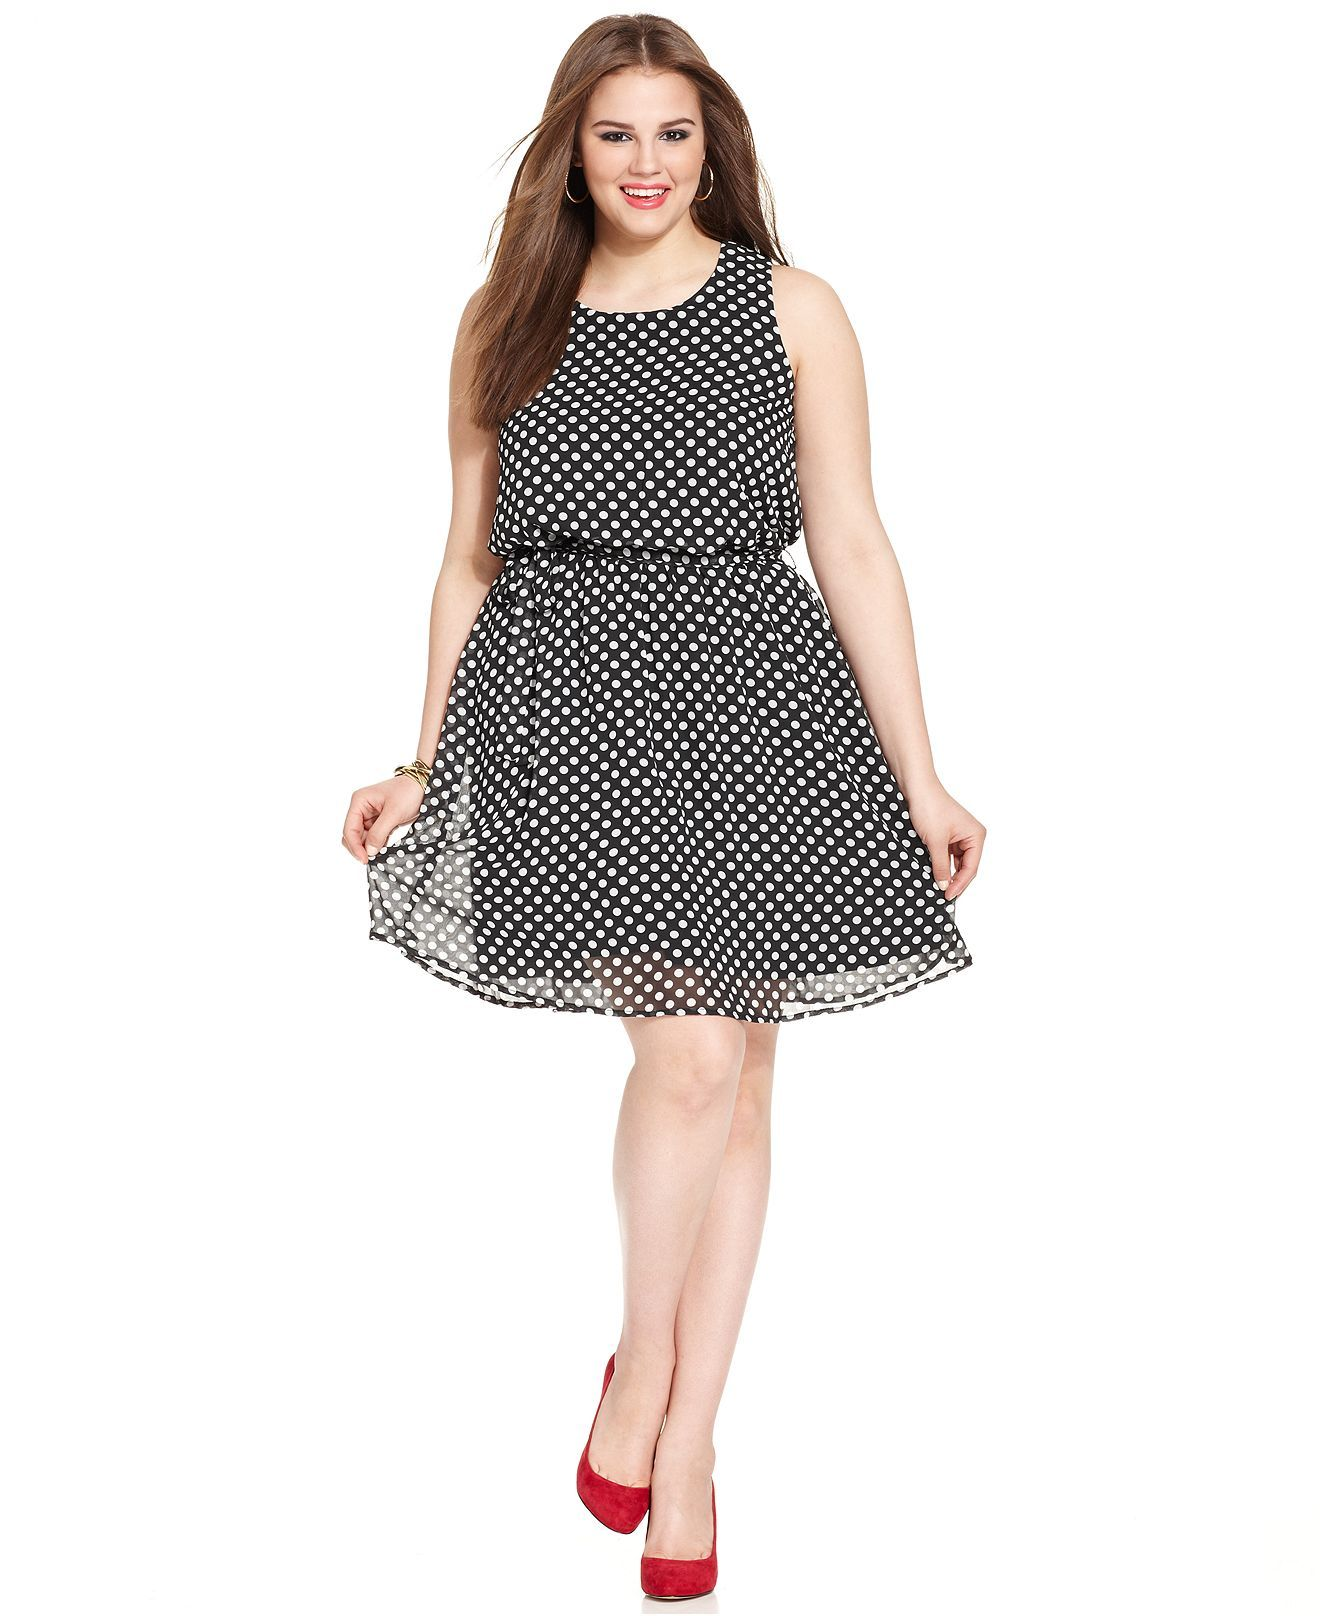 07cd5b4ee92fb Love Squared Plus Size Sleeveless Polka-Dot Dress - Junior Plus Sizes - Plus  Sizes - Macy's